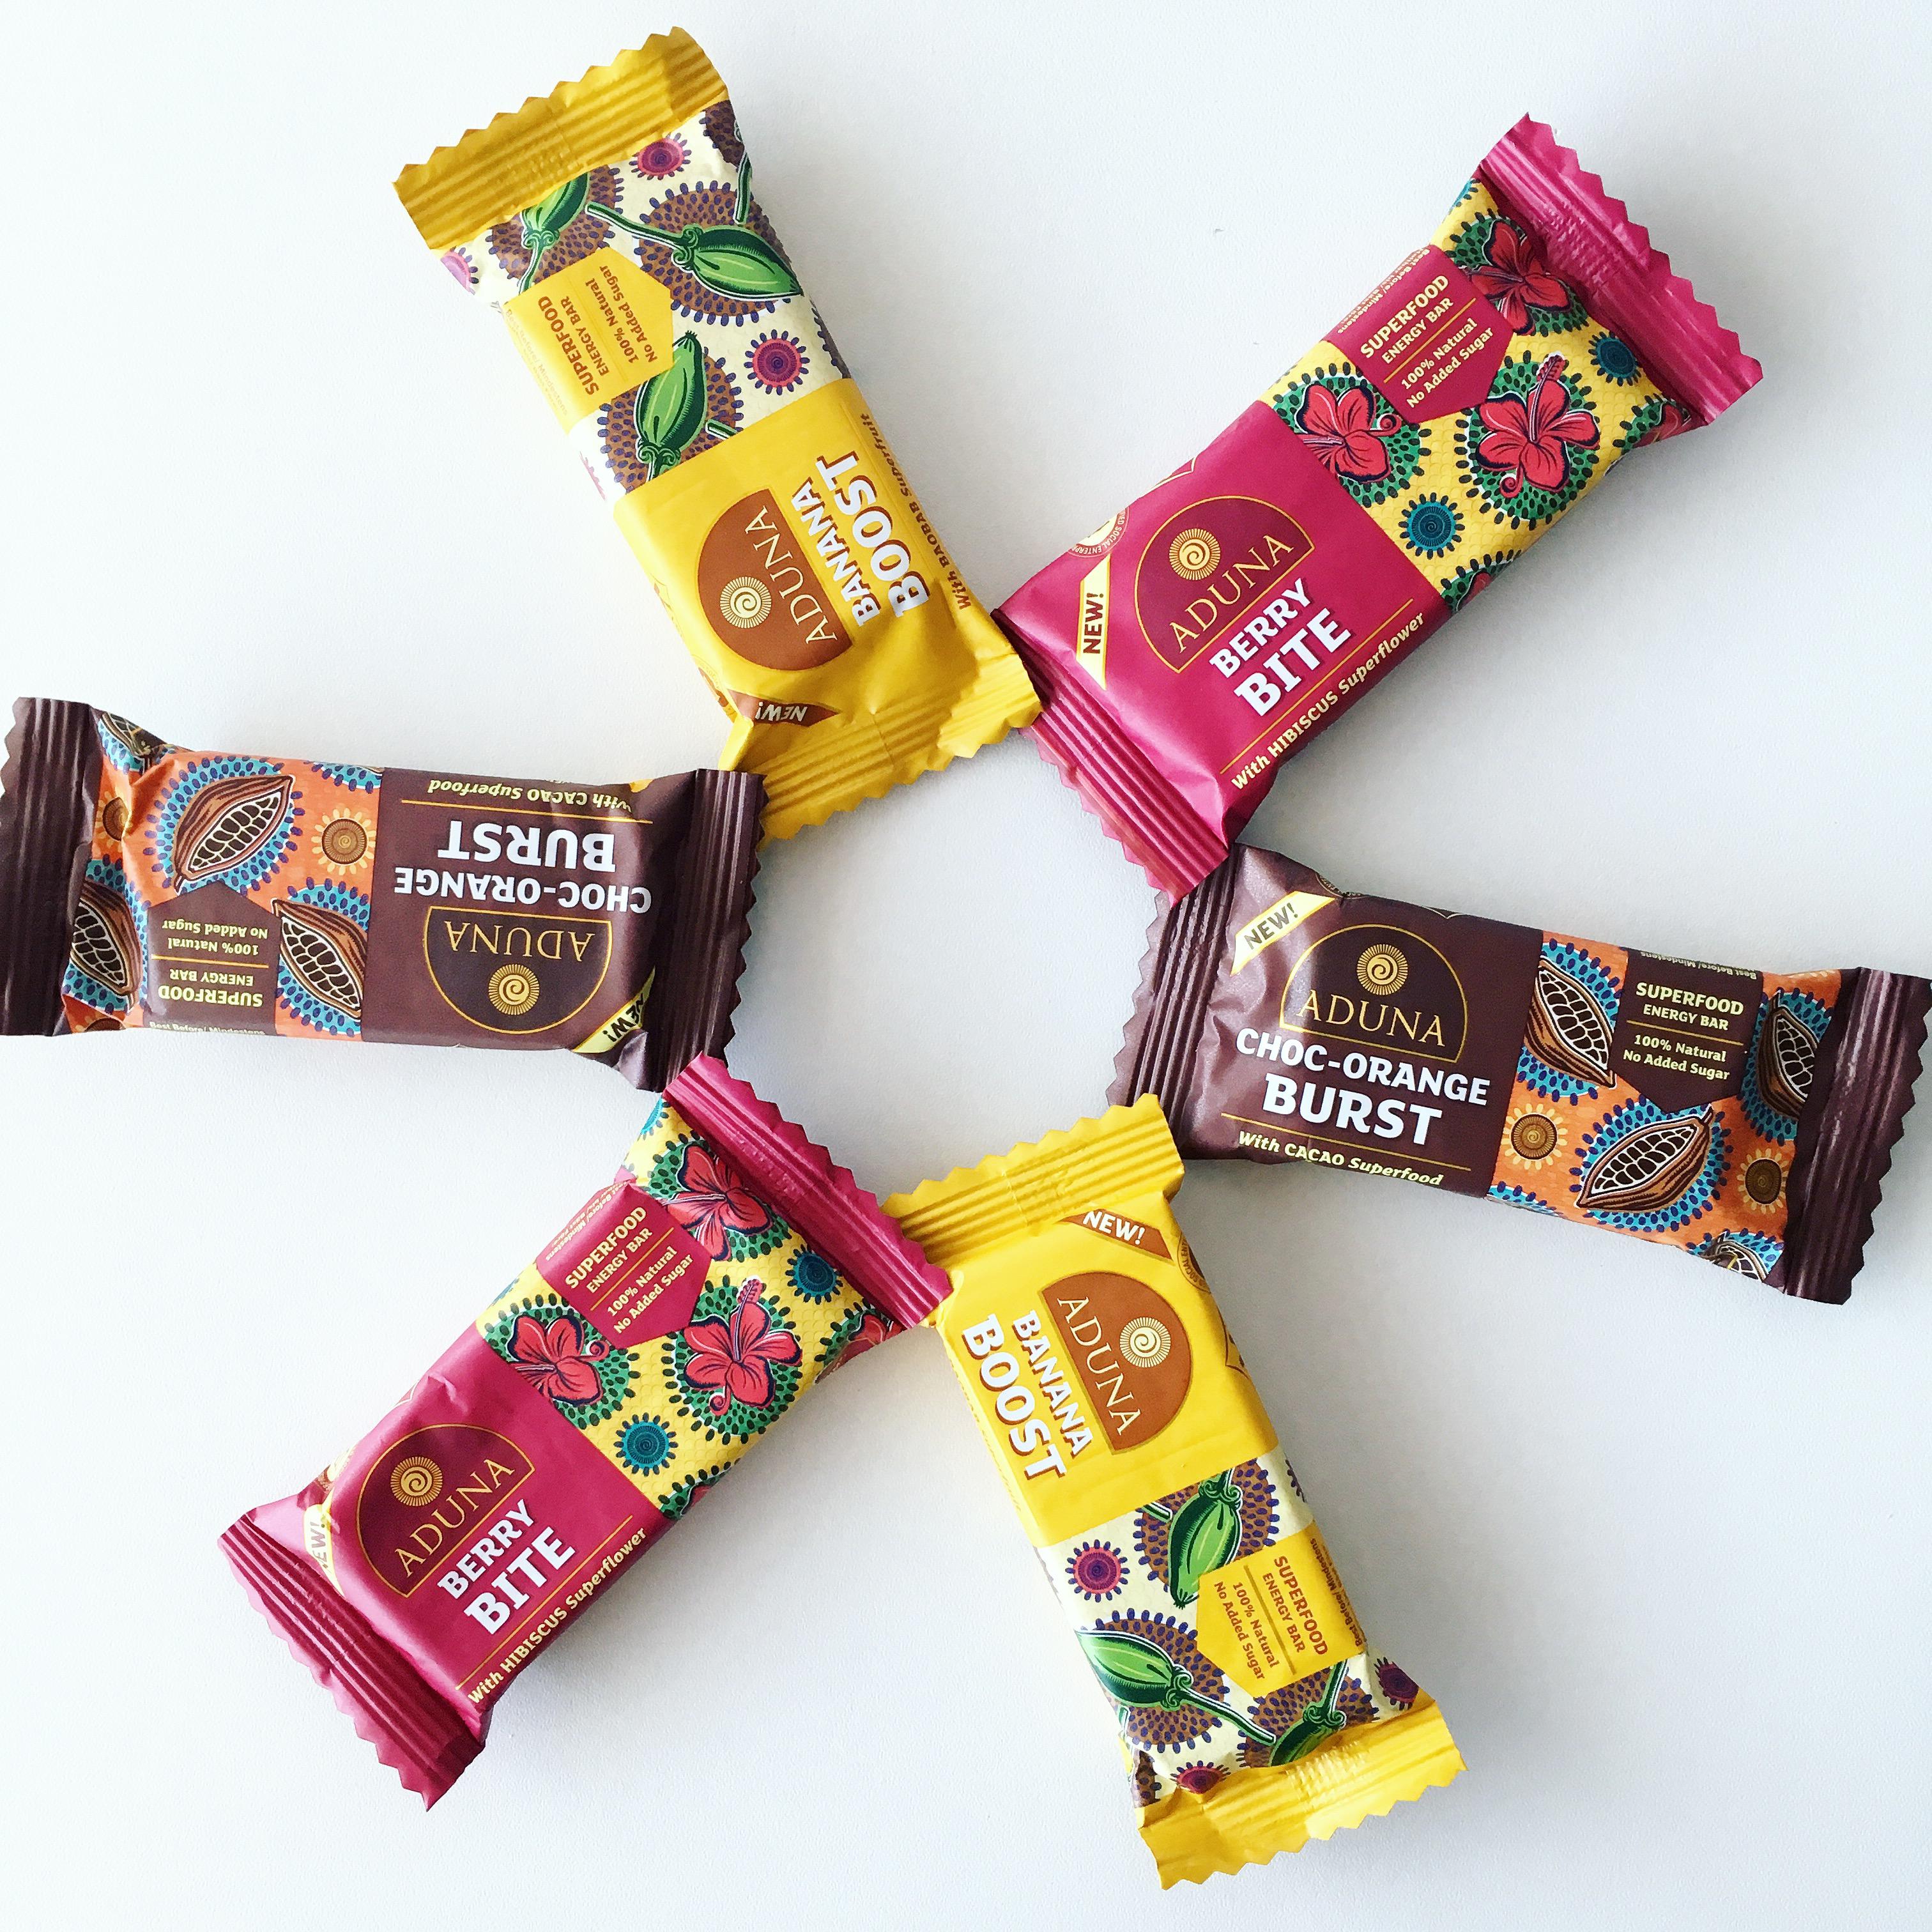 How to get a healthy chocolate fix as a vegan aduna superfood bars.JPG